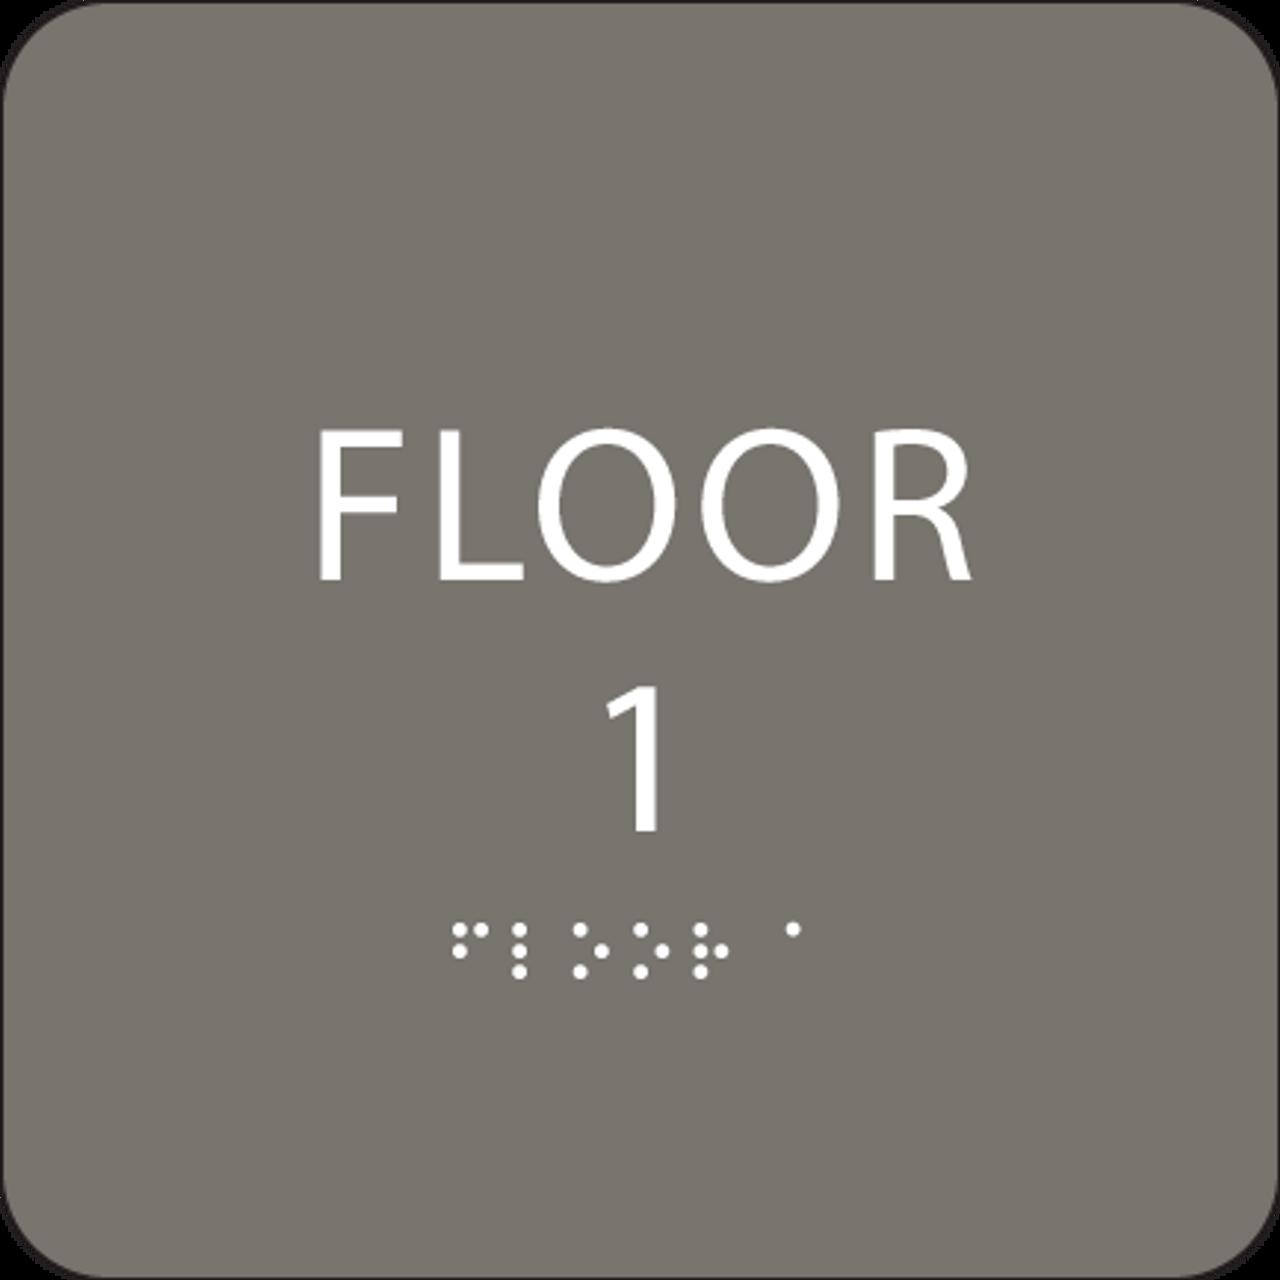 Dark Grey Floor 1 Identification Sign